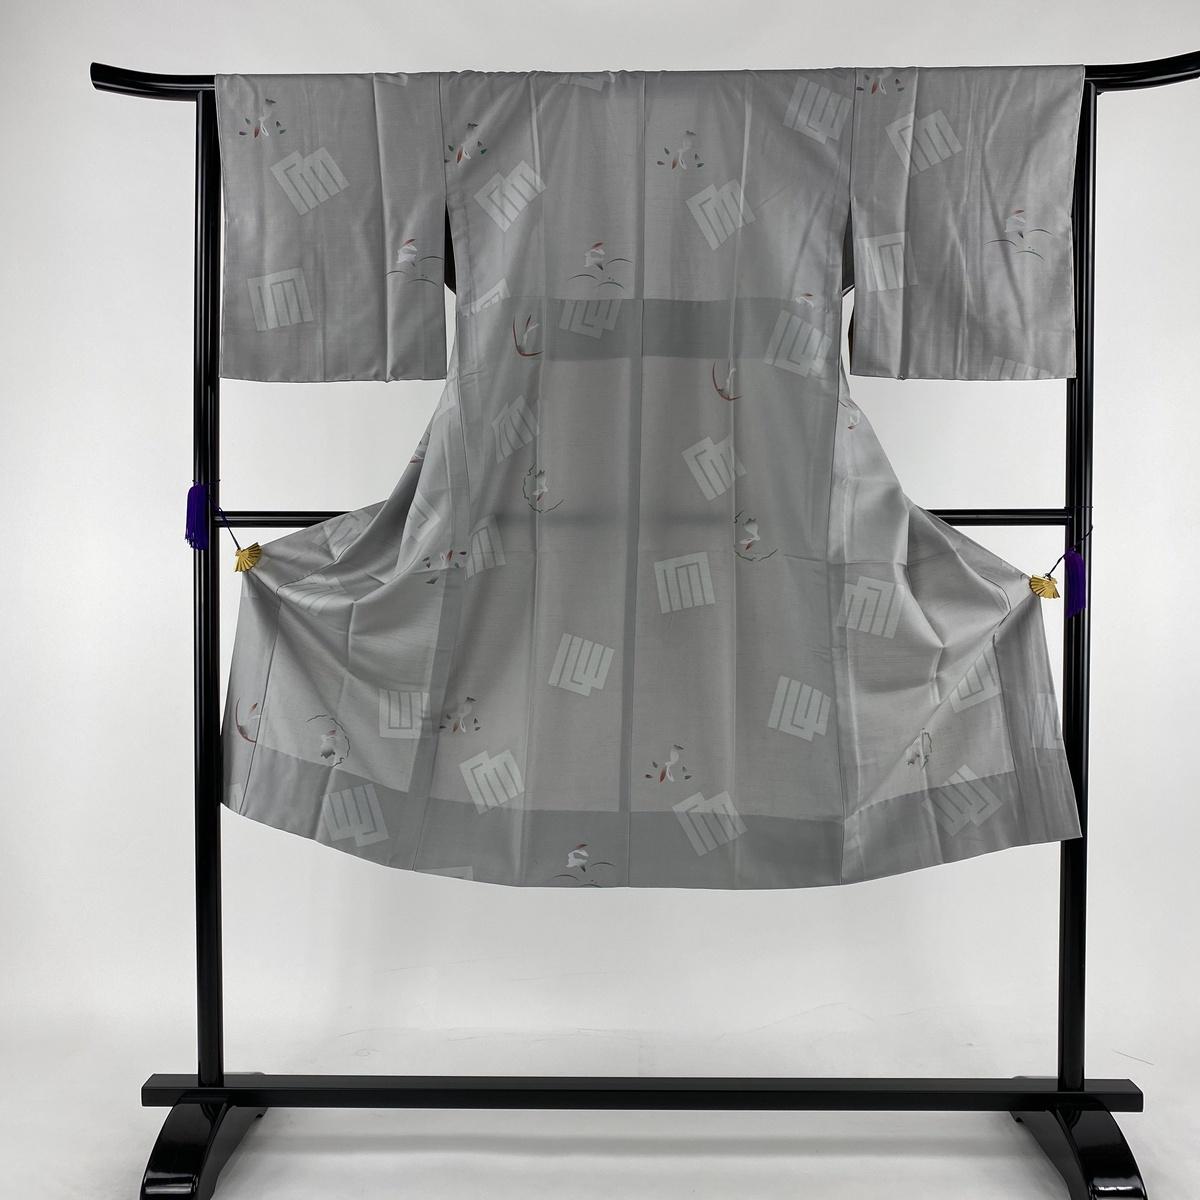 長襦袢 美品 秀品 やまと 源氏香 兎 灰色 身丈128.5cm 裄丈64cm M 正絹 【中古】